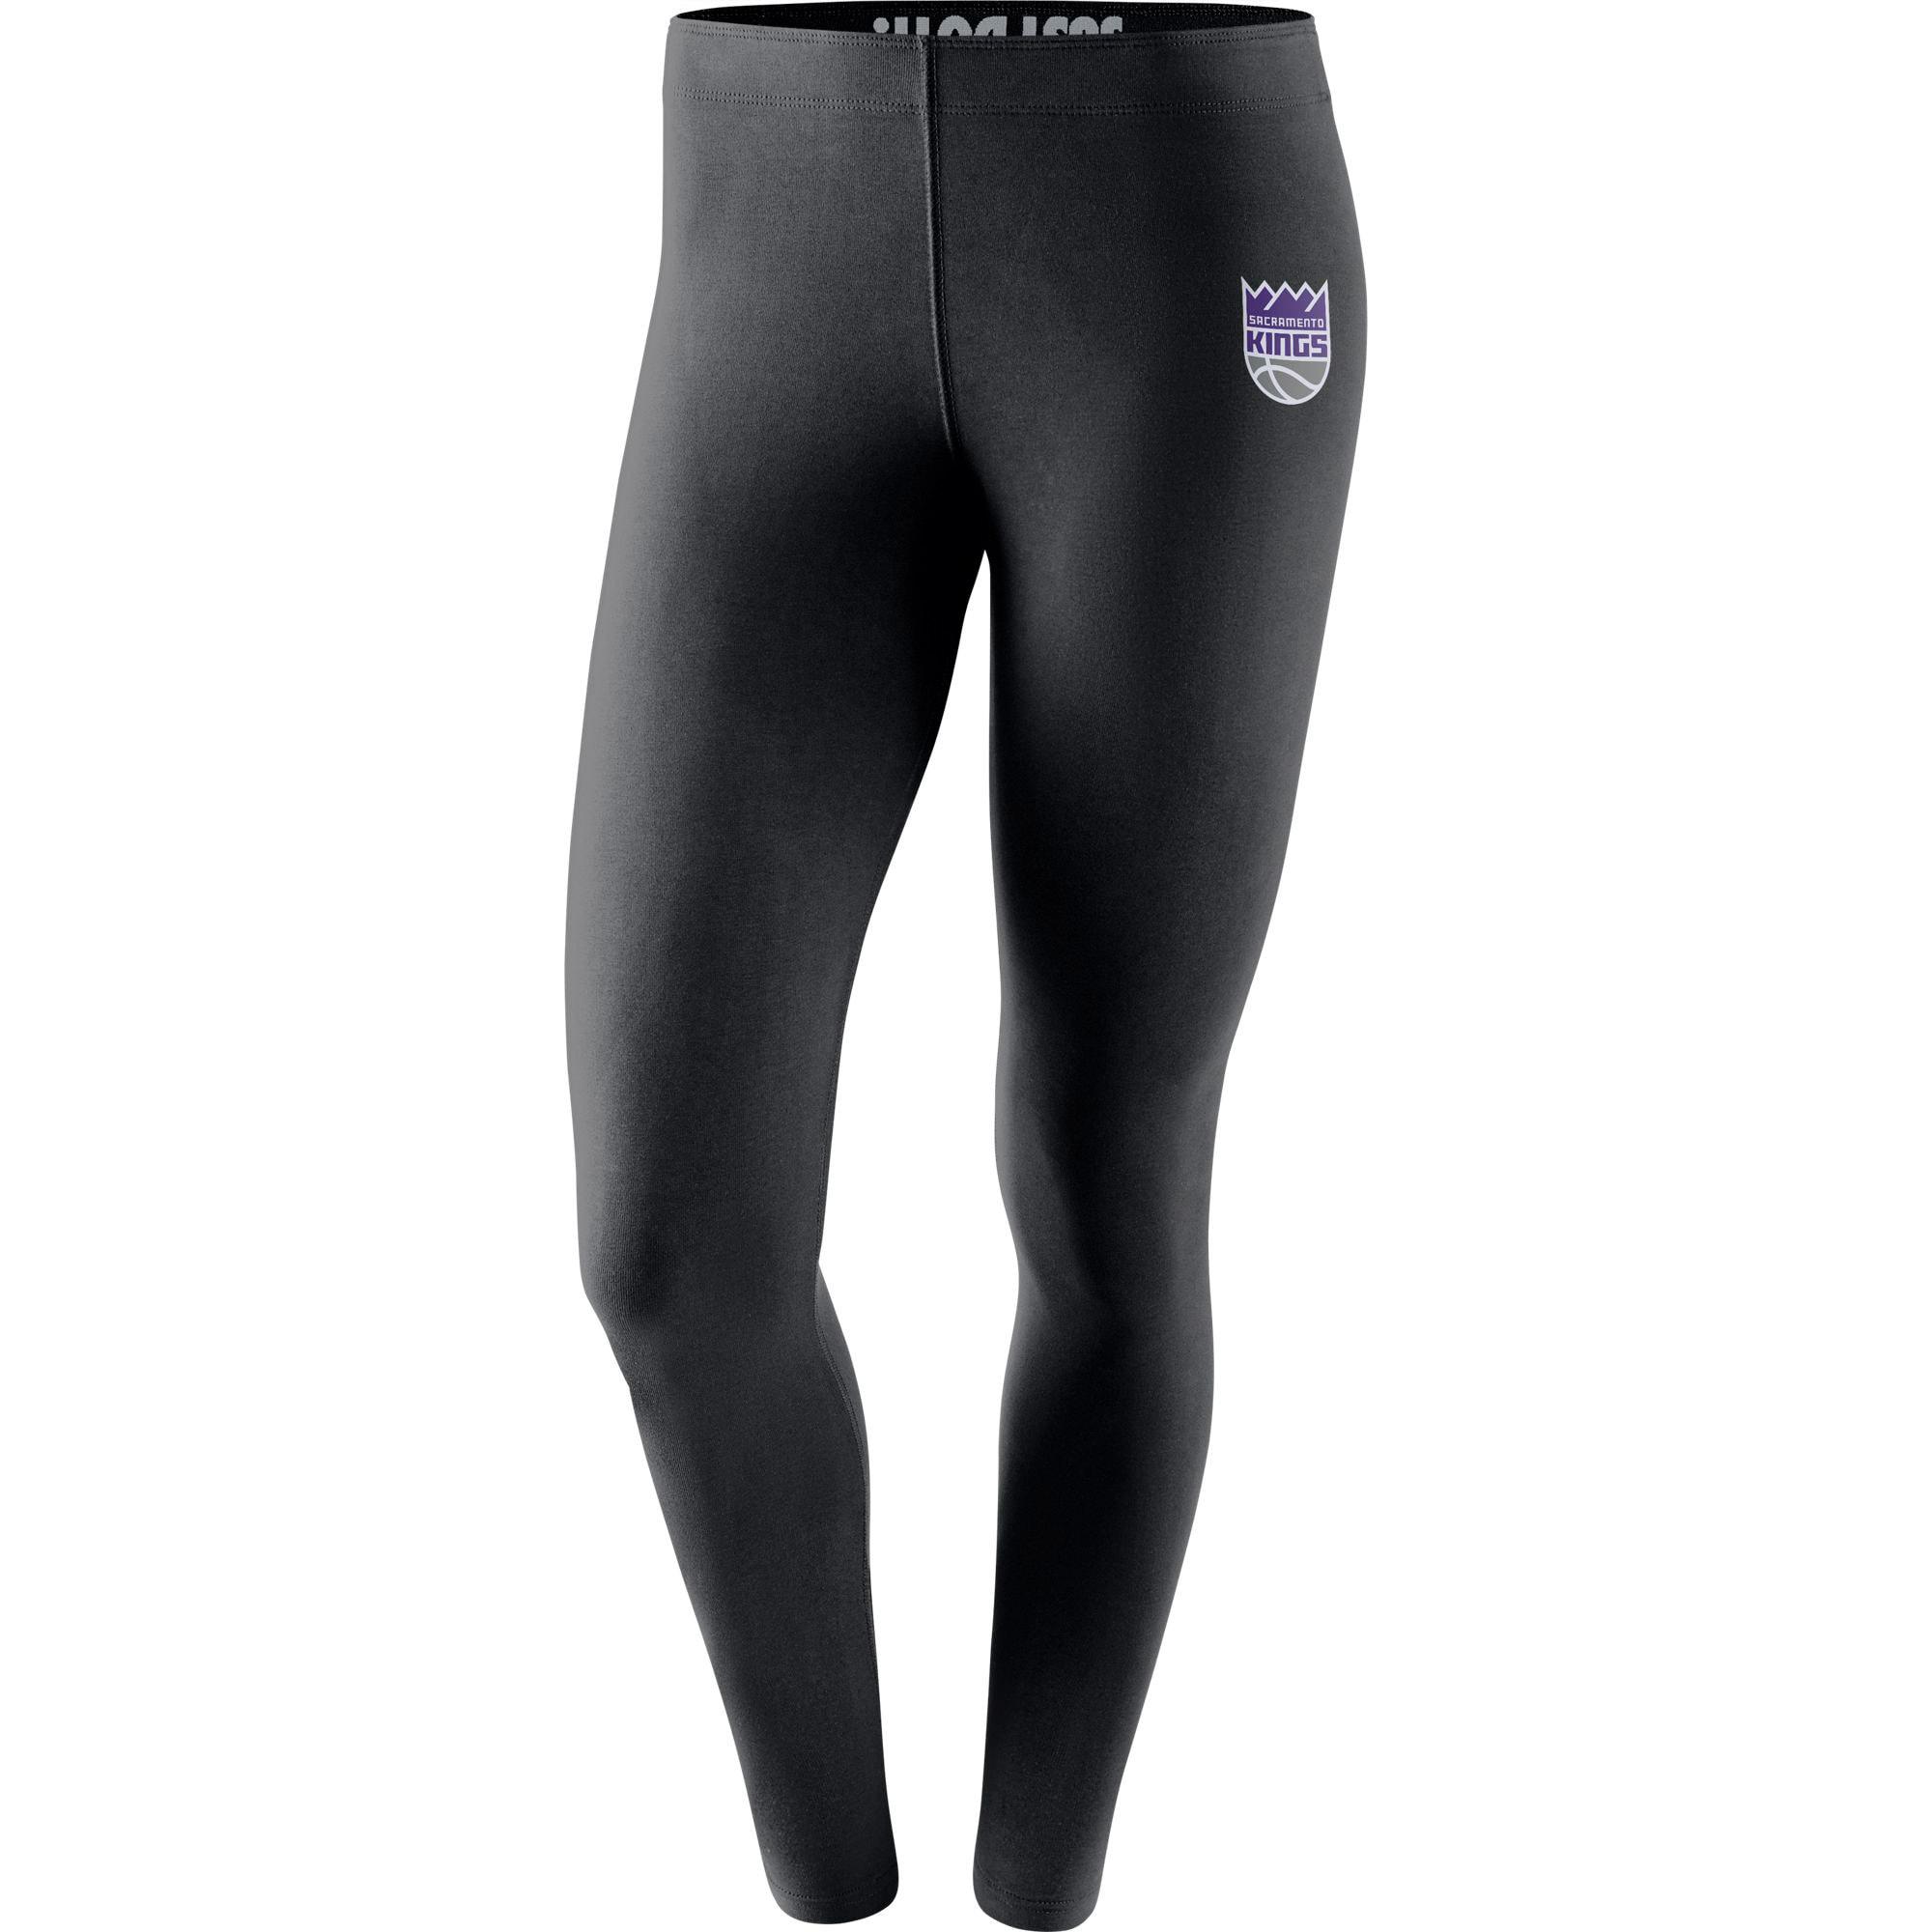 Sacramento Kings Nike Women's Leg-A-See Tights - Black